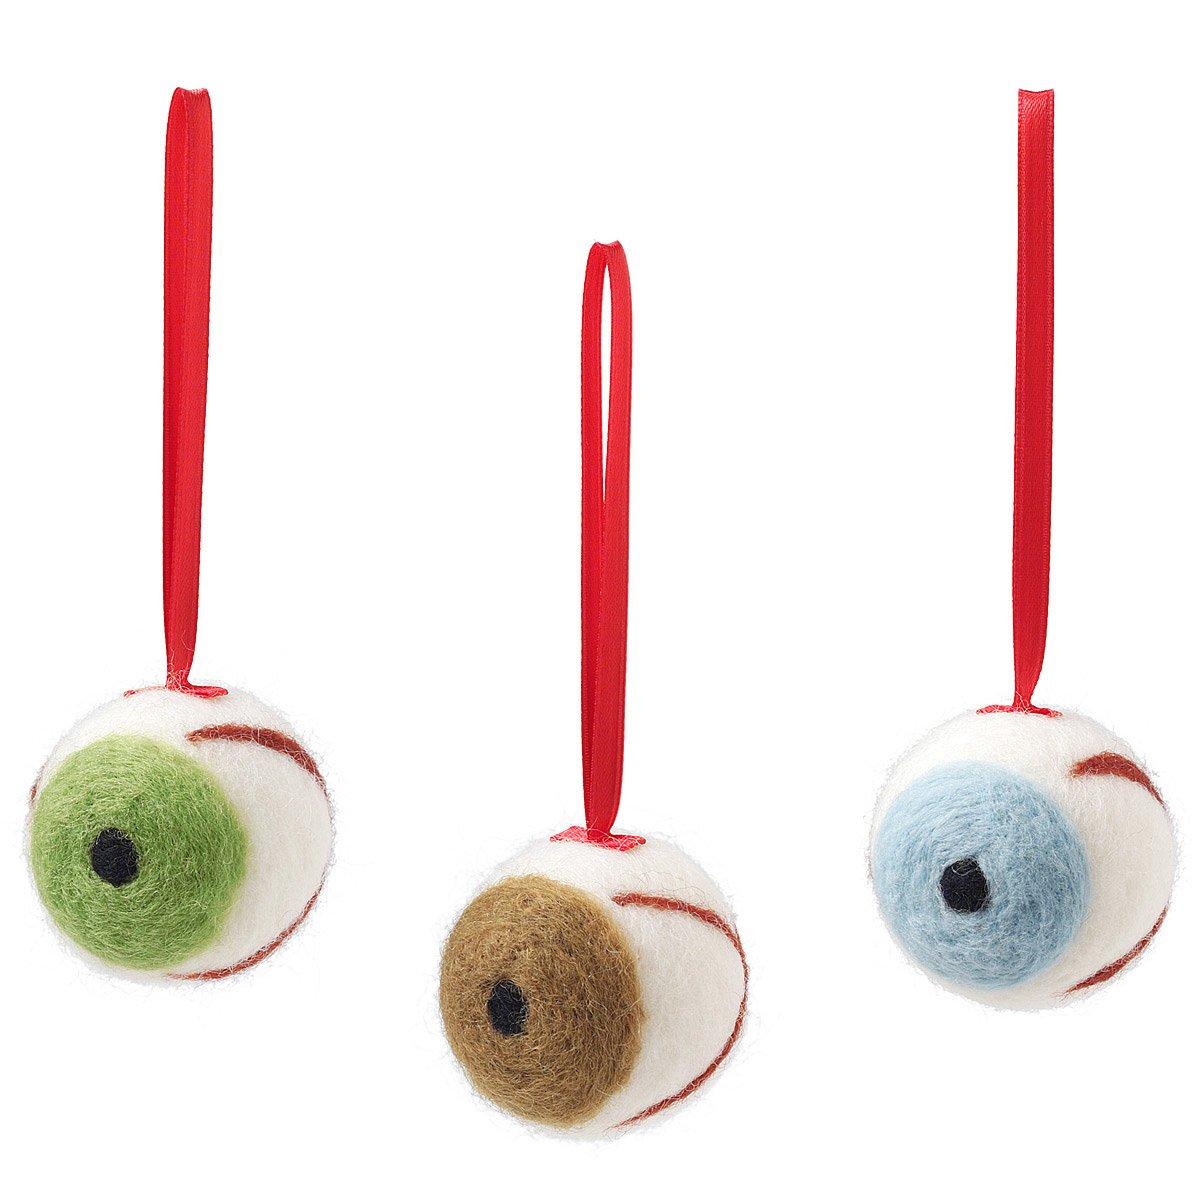 Eyeball christmas ornaments - Ornaments Halloween Decoration Christmas Tree Fun Quirky Eyes